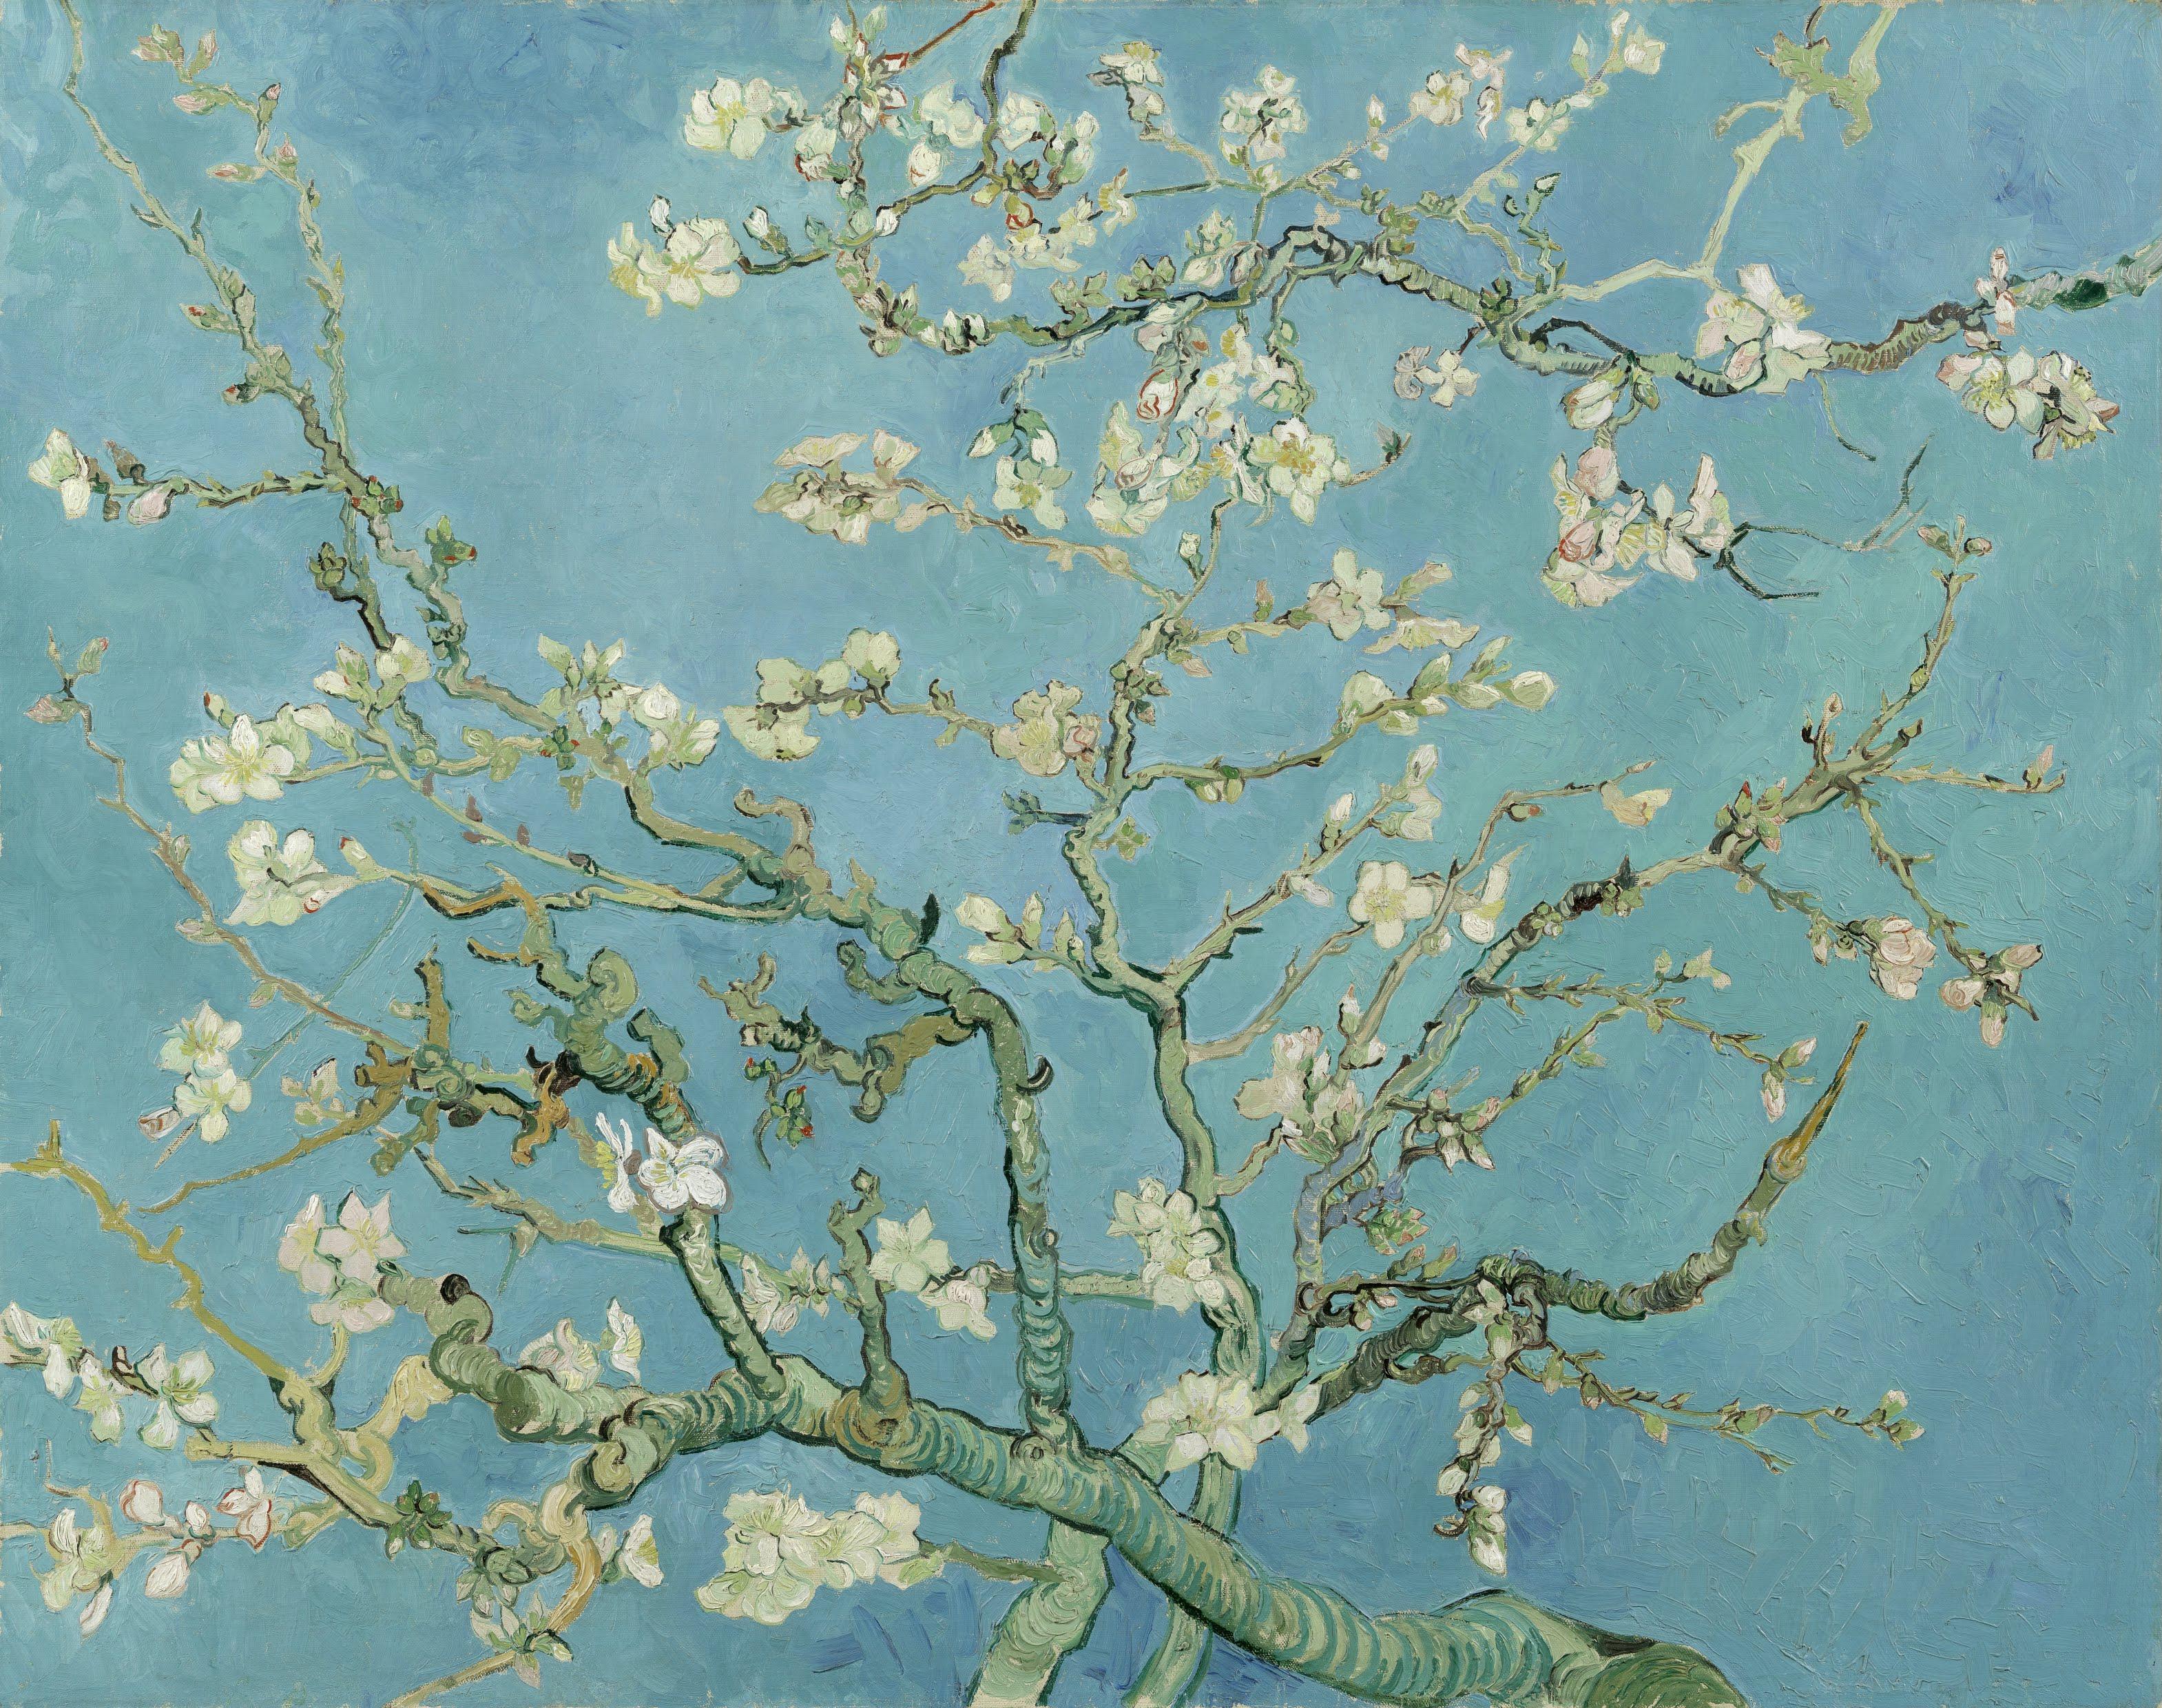 Drawn sakura blossom almond tree Almond Blossom Blossoms Wikipedia 1890